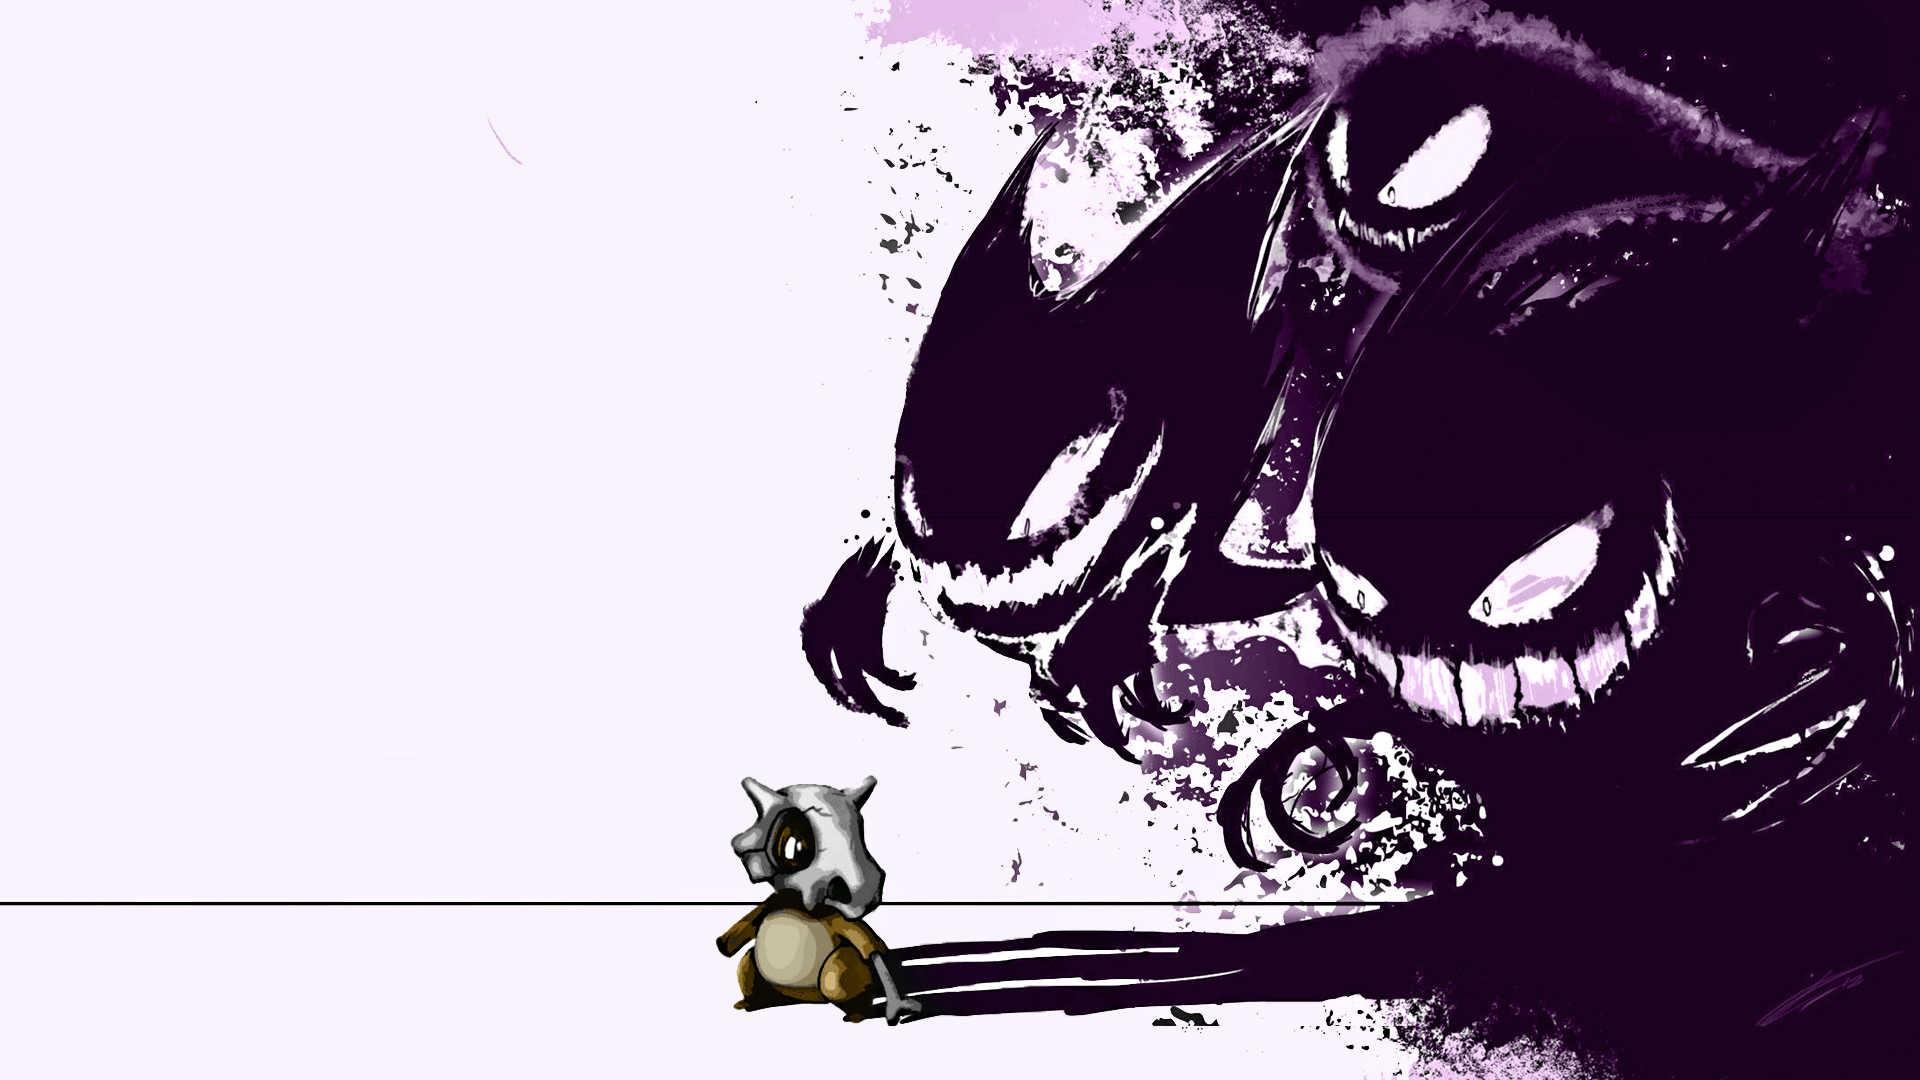 pokemon desktop wallpaper download free backgrounds for desktop